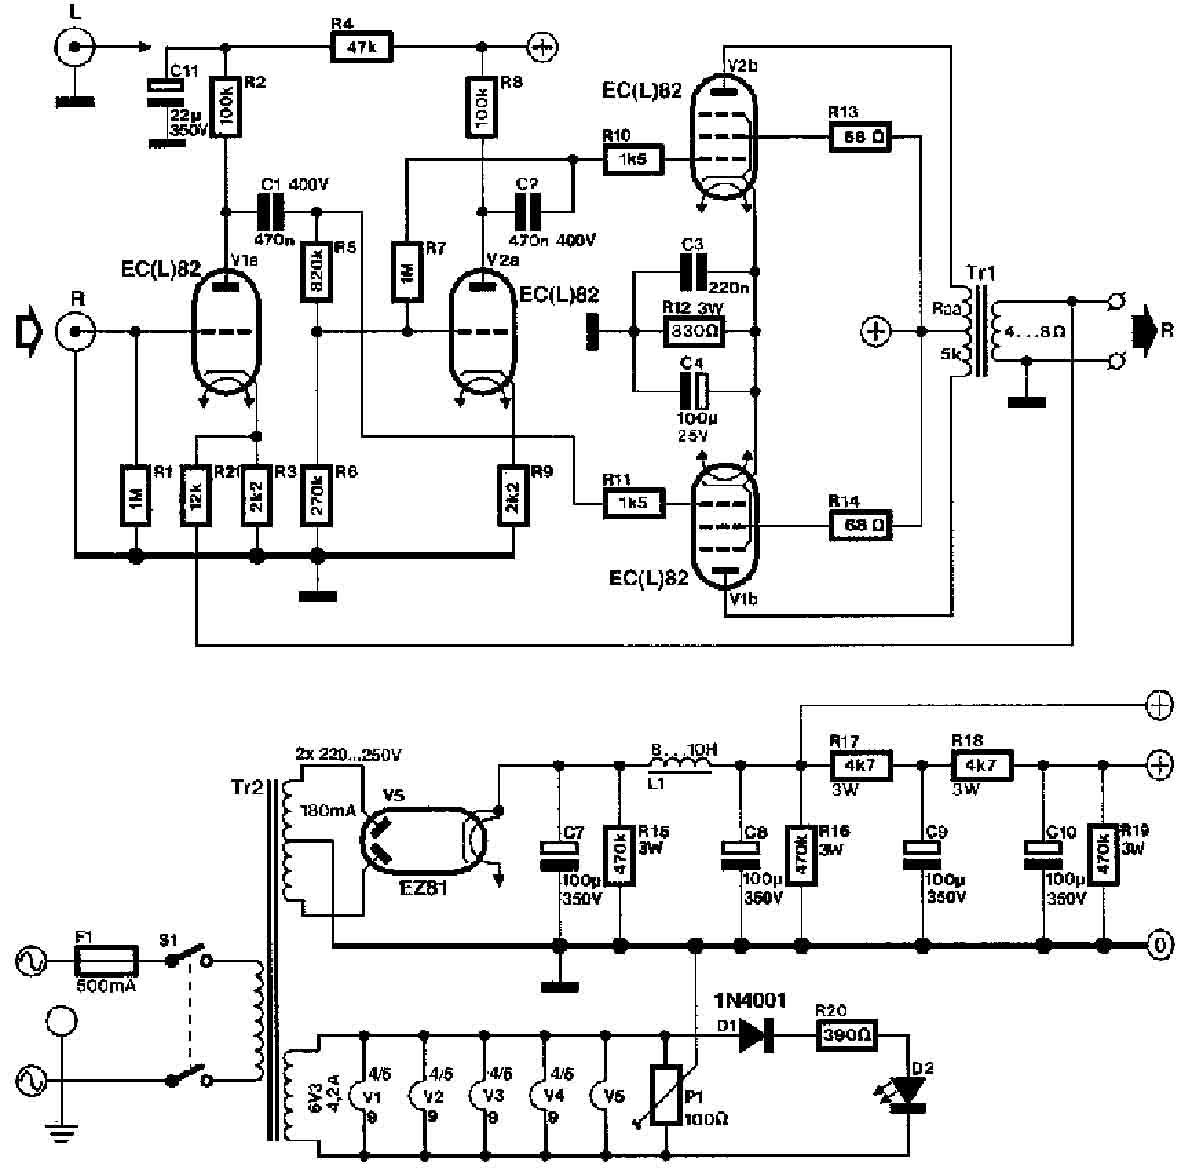 Audiofanaticschemi Pphtml Amplifier With El34 Ecc83 Ecc82 Circuit Schematic Explanation